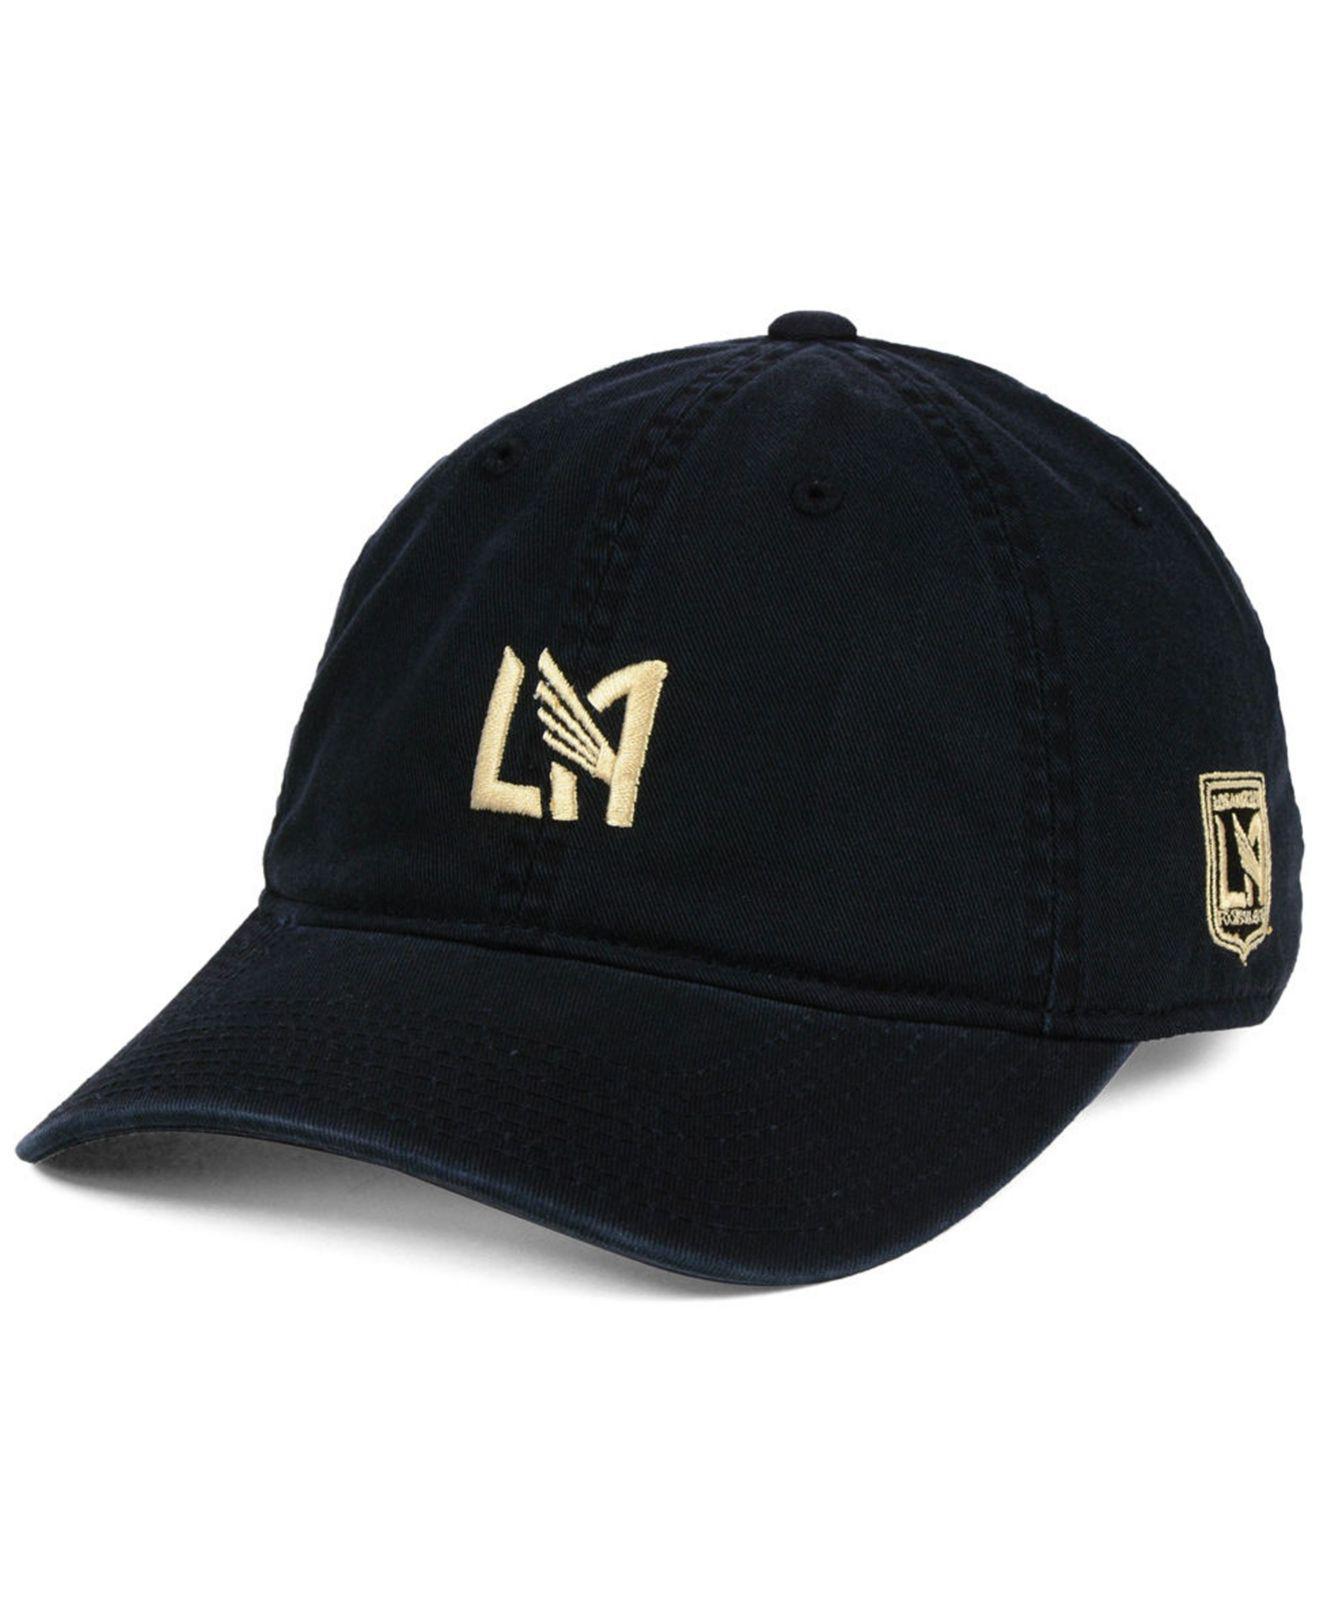 buy popular 4fa0d 1aa22 ... discount lyst adidas los angeles football club partial logo dad cap in  0d069 20da0